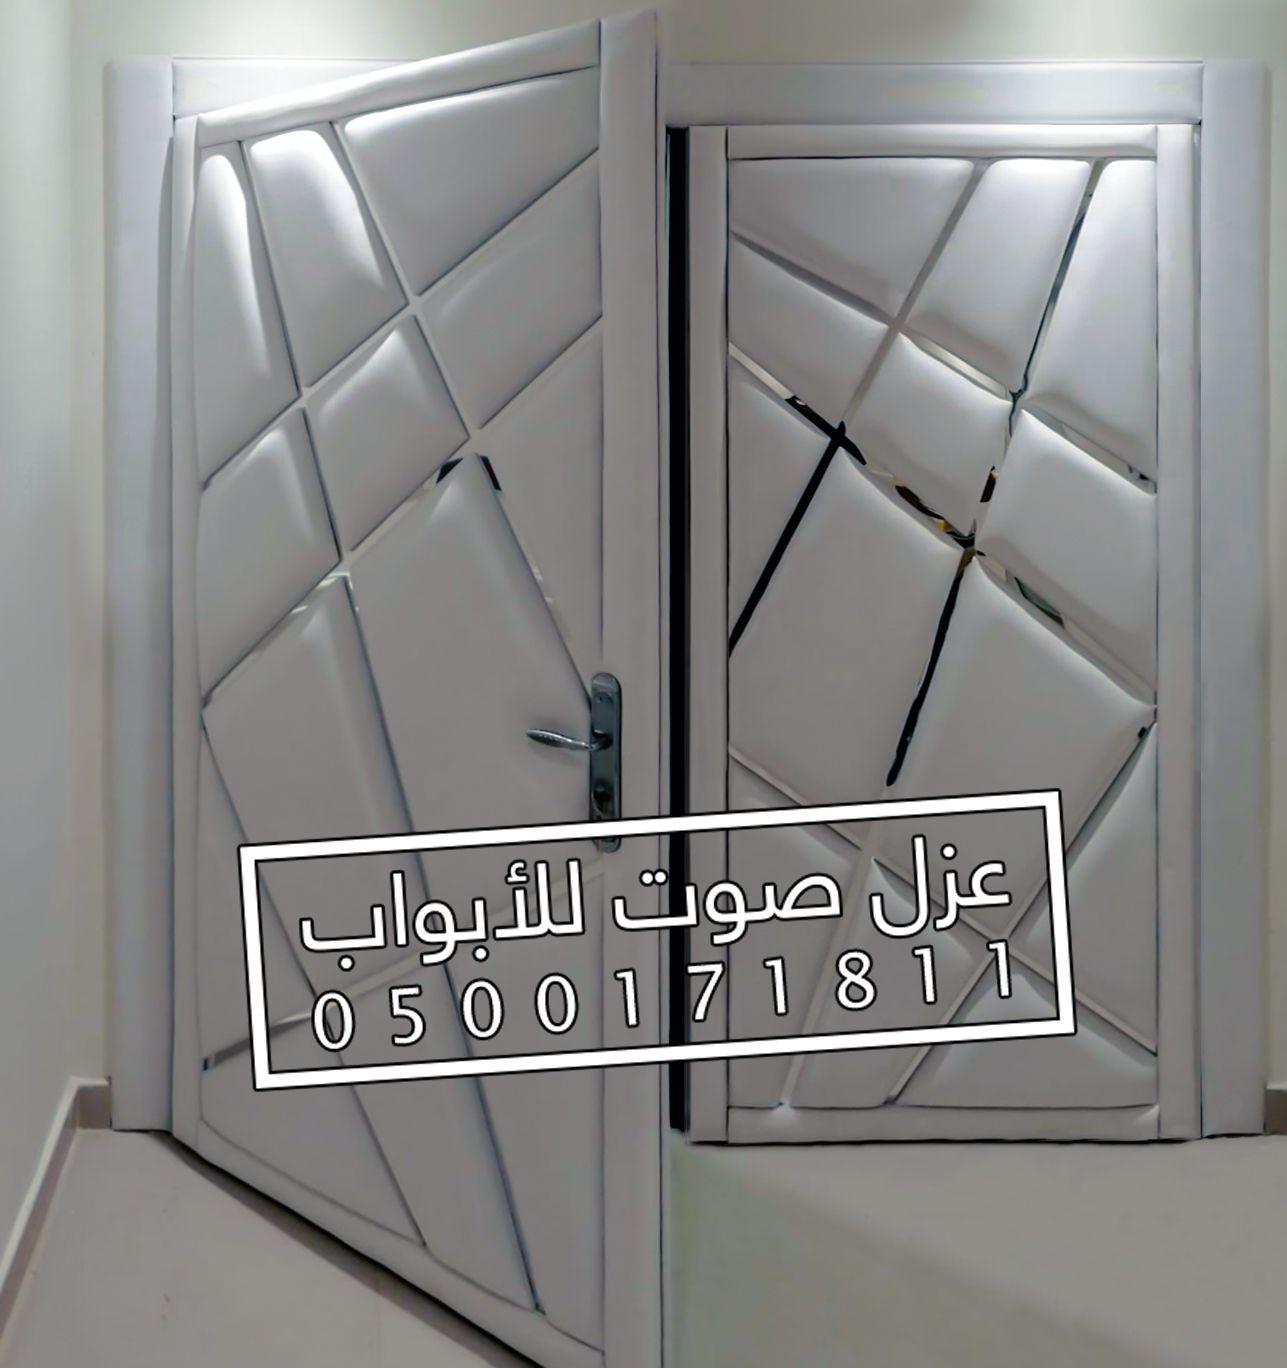 عزل باب ابواب الرياض Home Decor Decals Home Decor